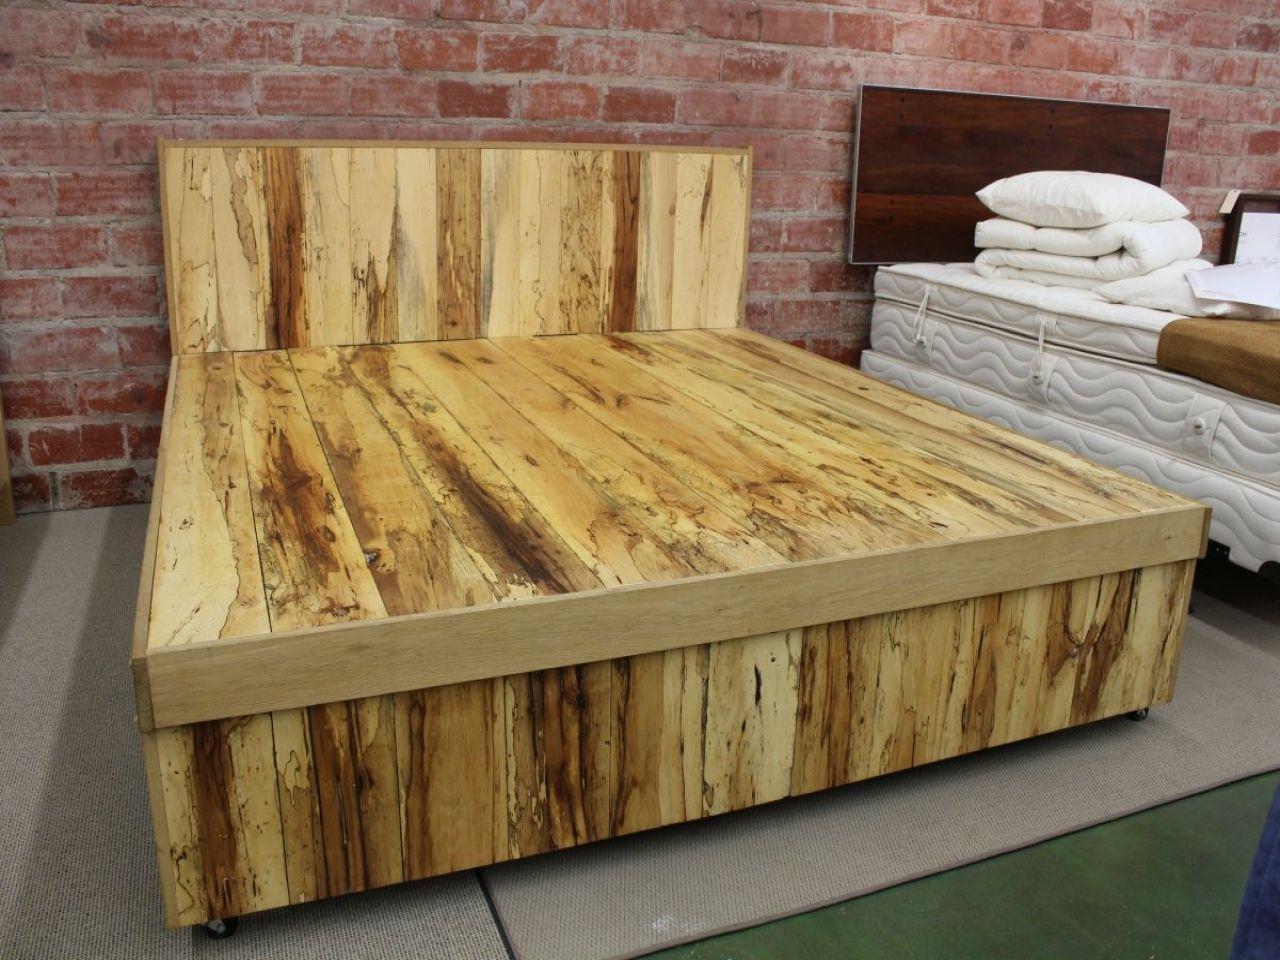 Design Rustic Beds image result for rustic beds pinterest bed beds